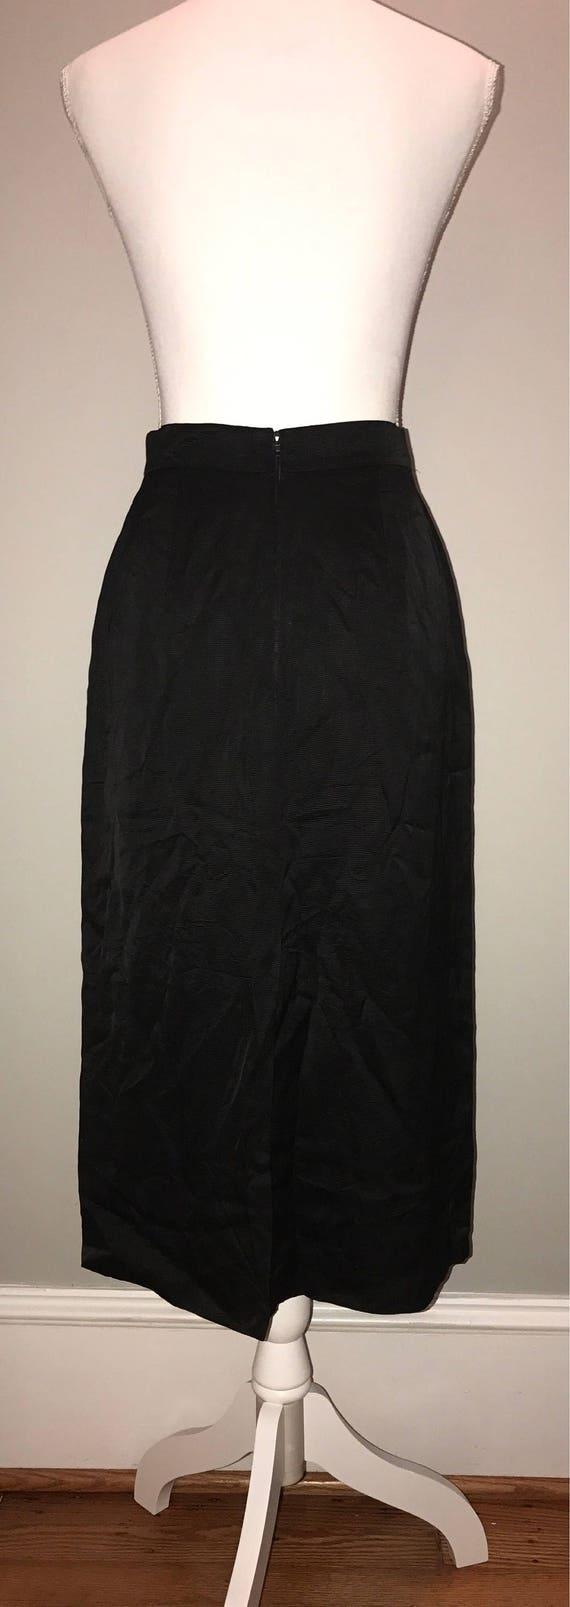 Vintage 80's Black Pencil Skirt / size 36 (US 6) … - image 4